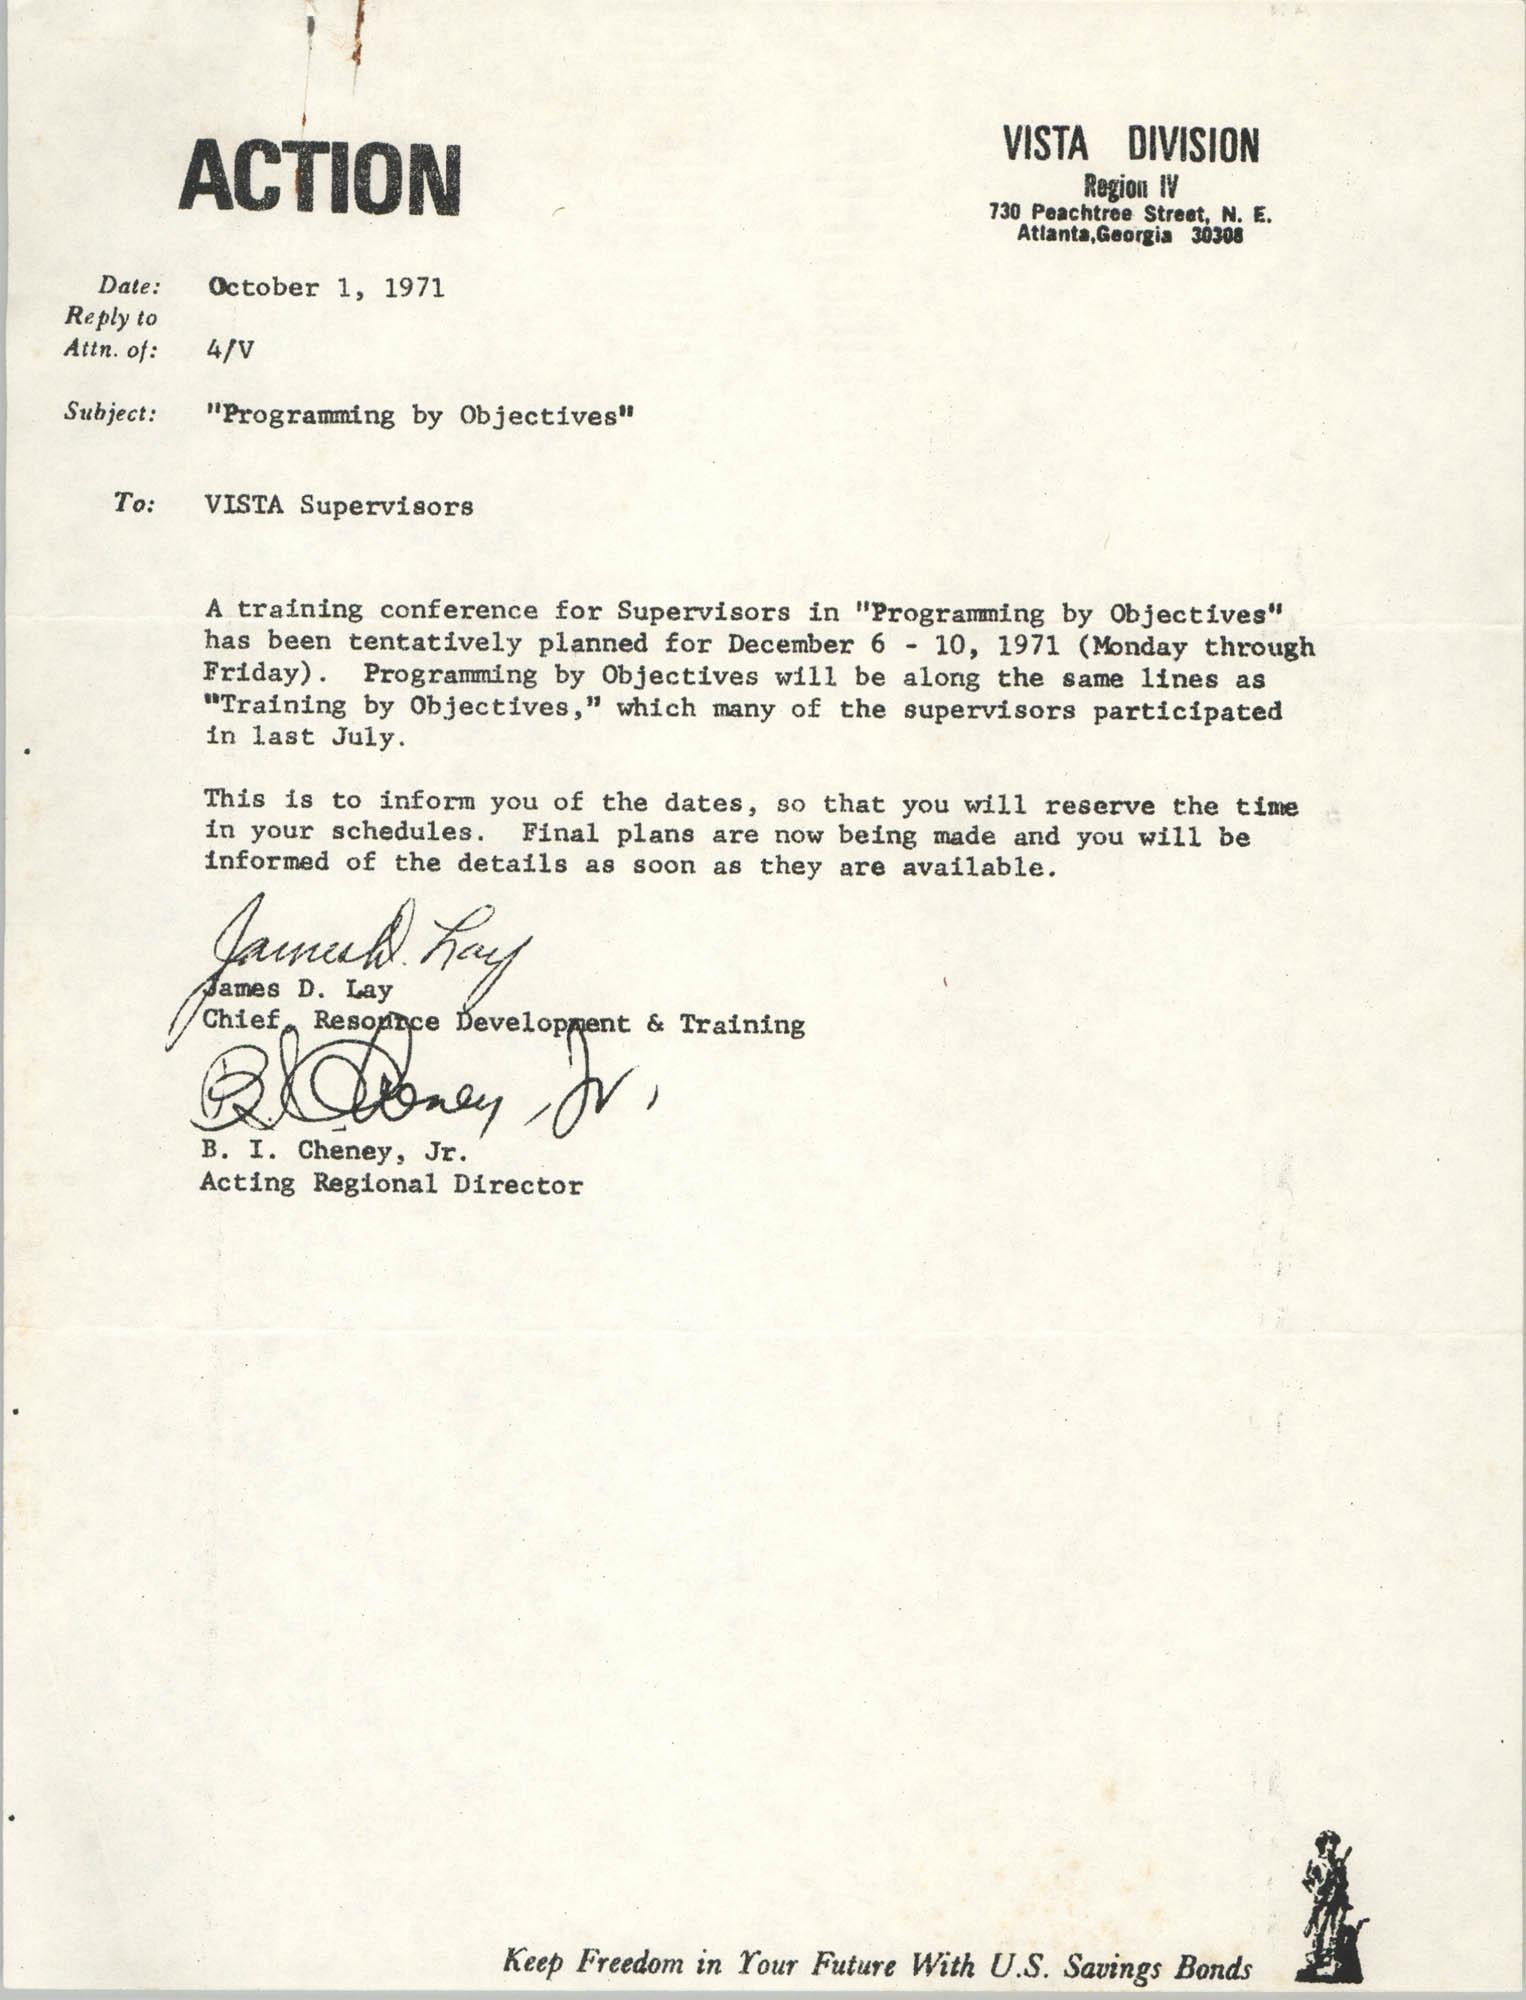 Memorandum from James D. Lay and B. I. Cheney, Jr. to VISTA Supervisors, October 1, 1971